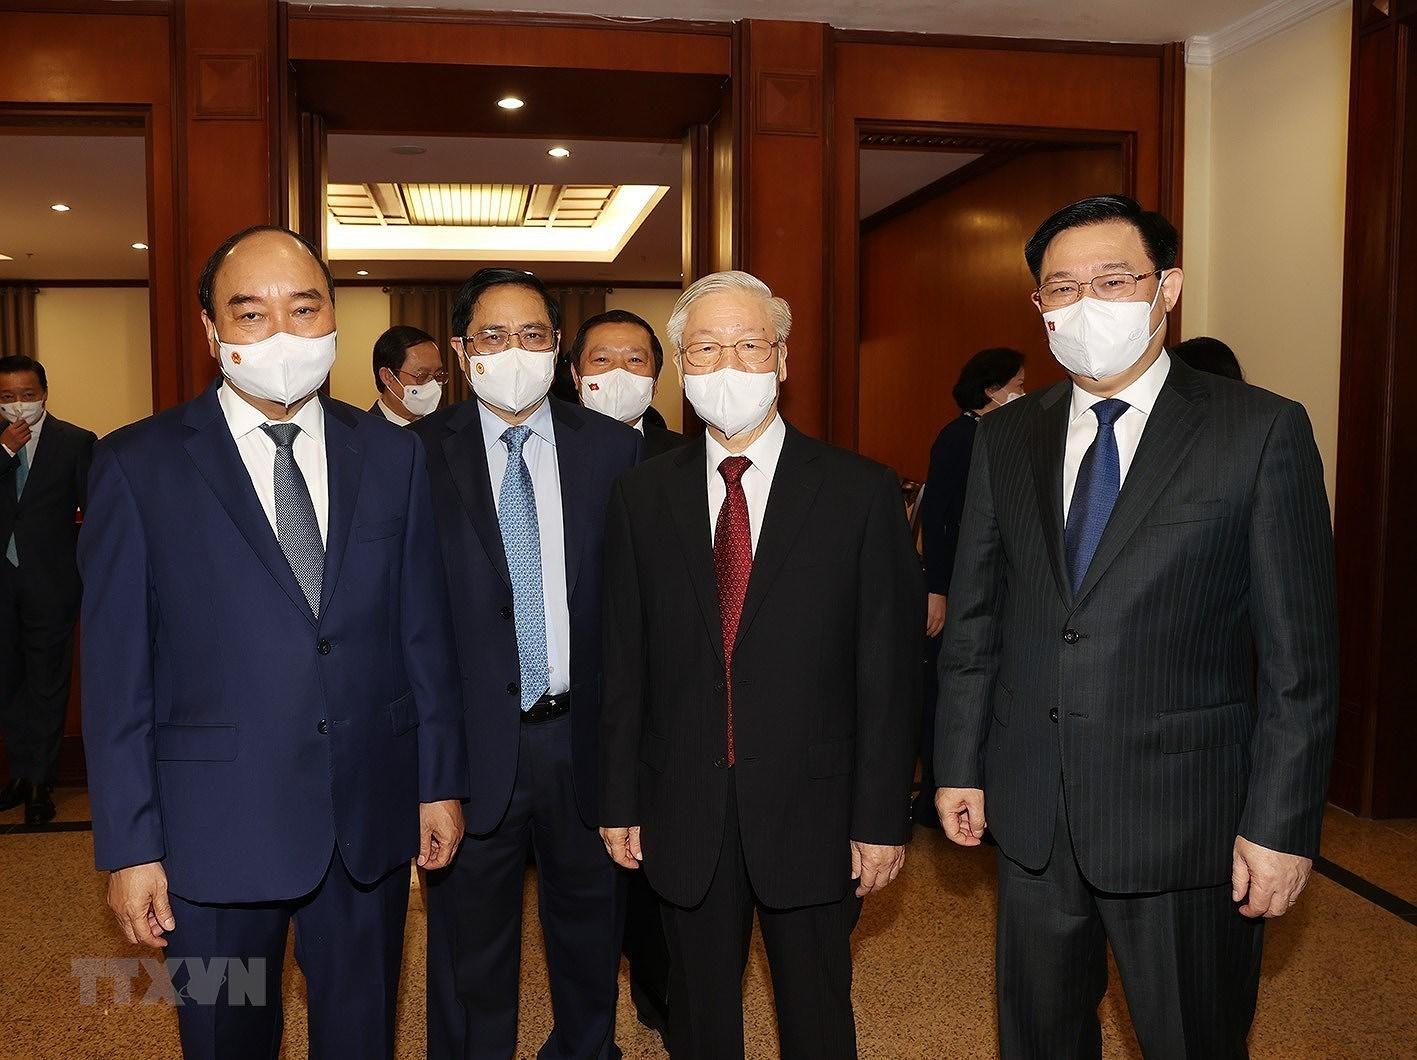 [Photo] Hoi nghi lan thu tu Ban Chap hanh Trung uong Dang khoa XIII hinh anh 5